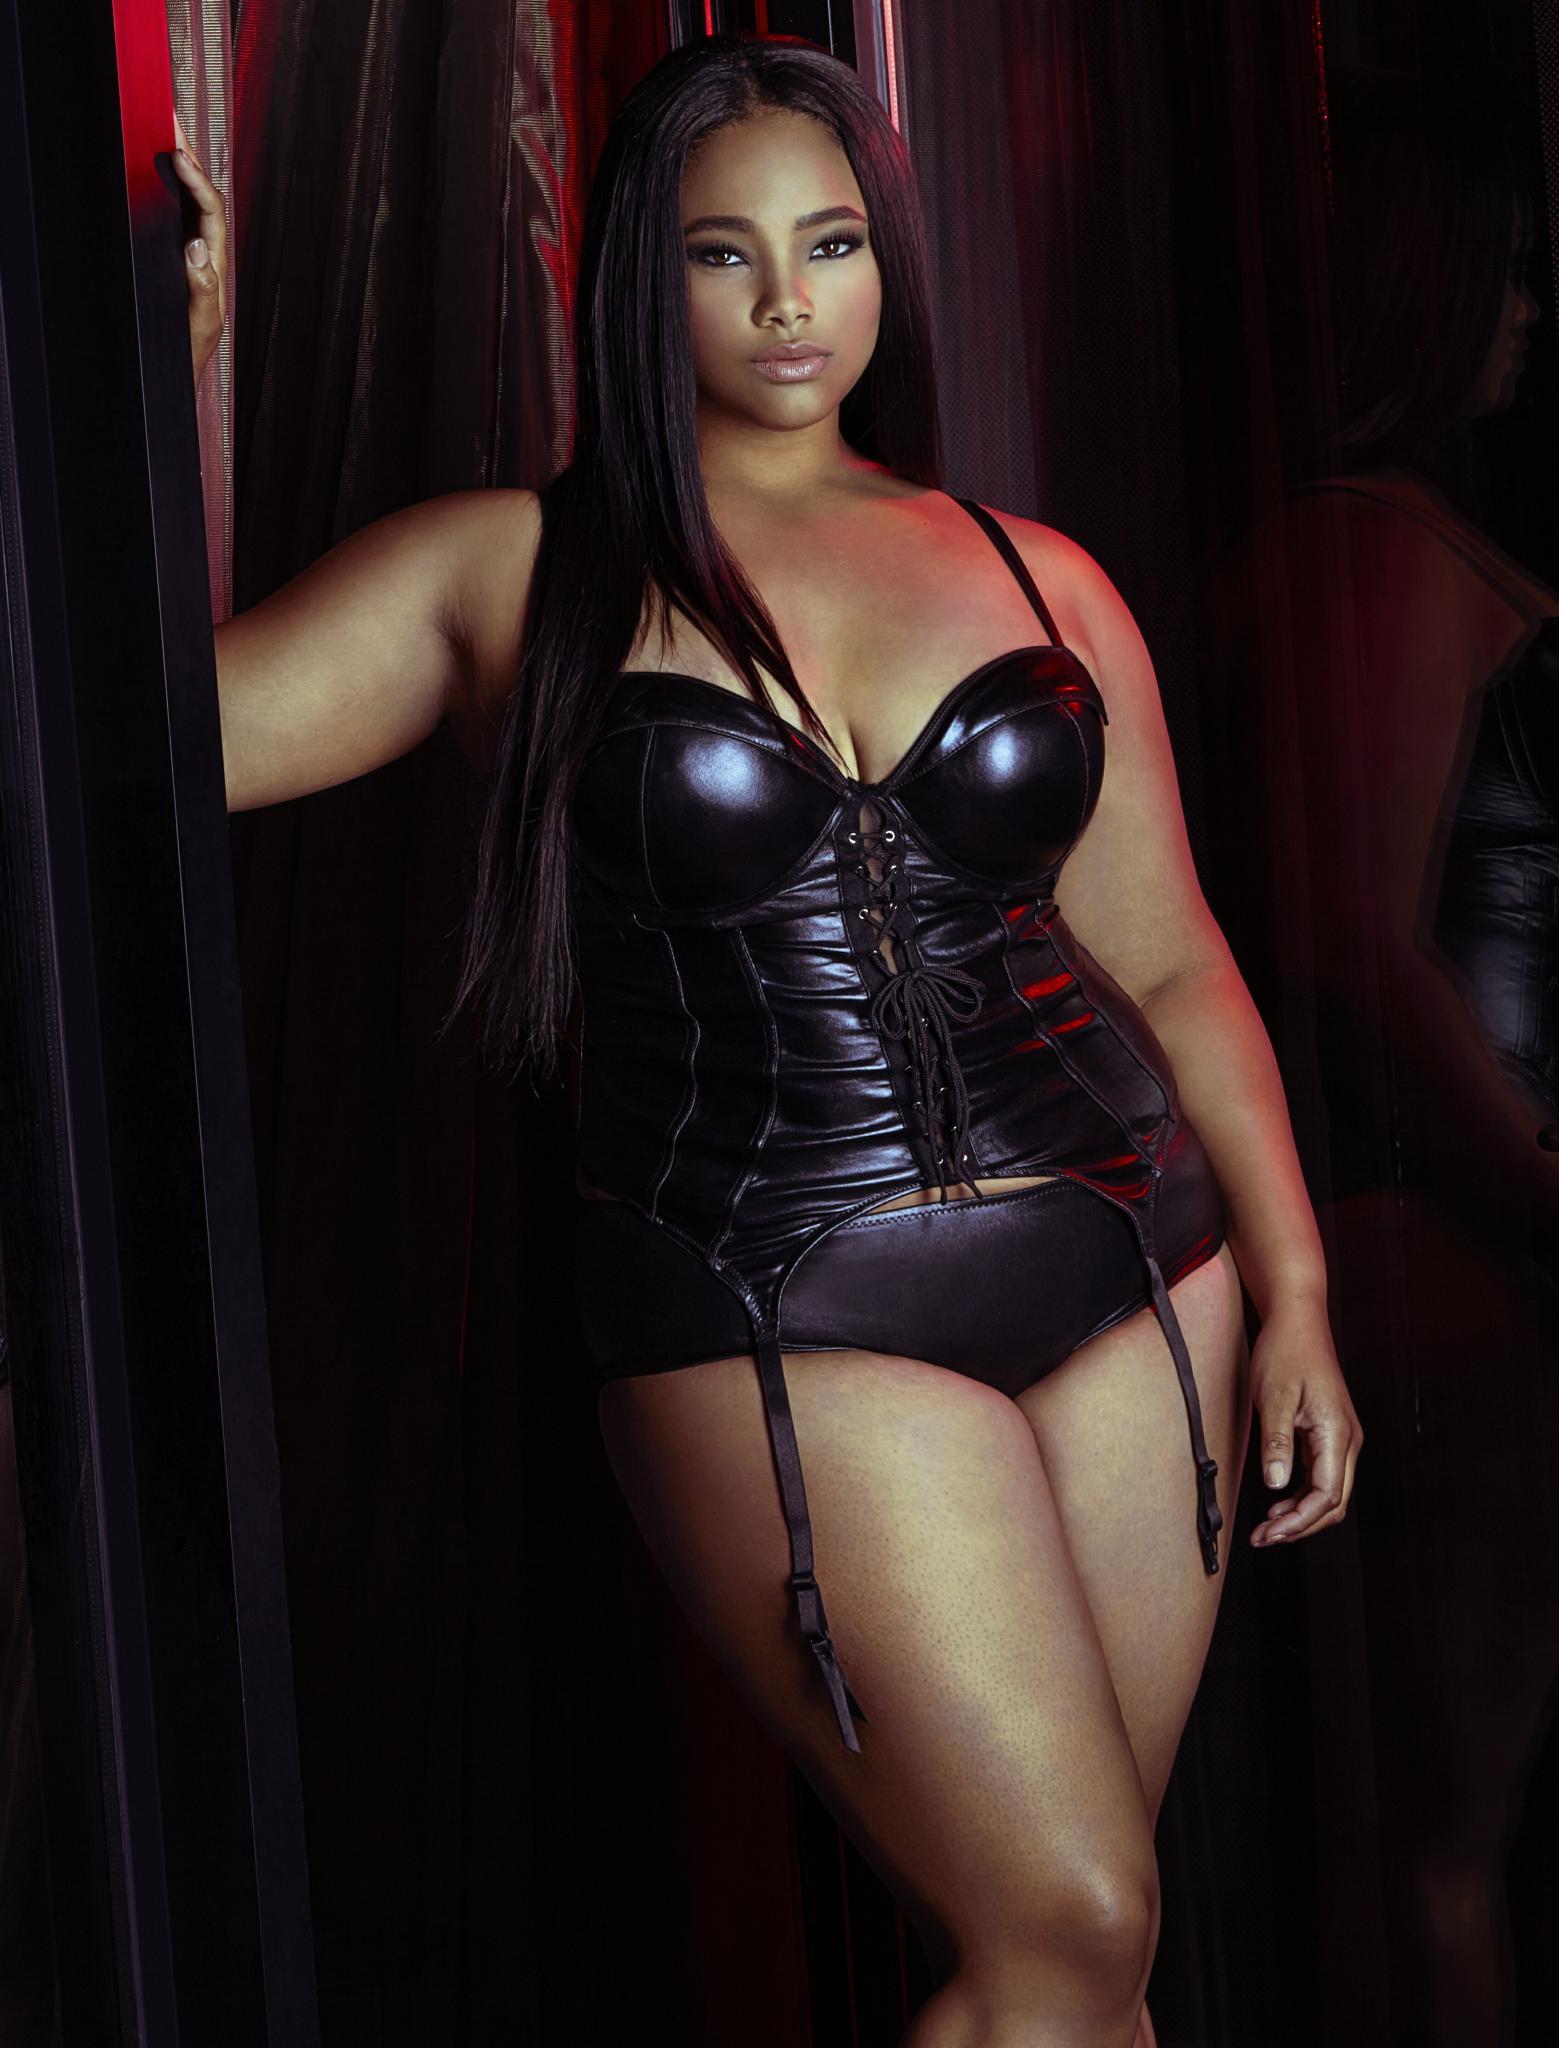 Curvy Model of The Month: Anita Marshall